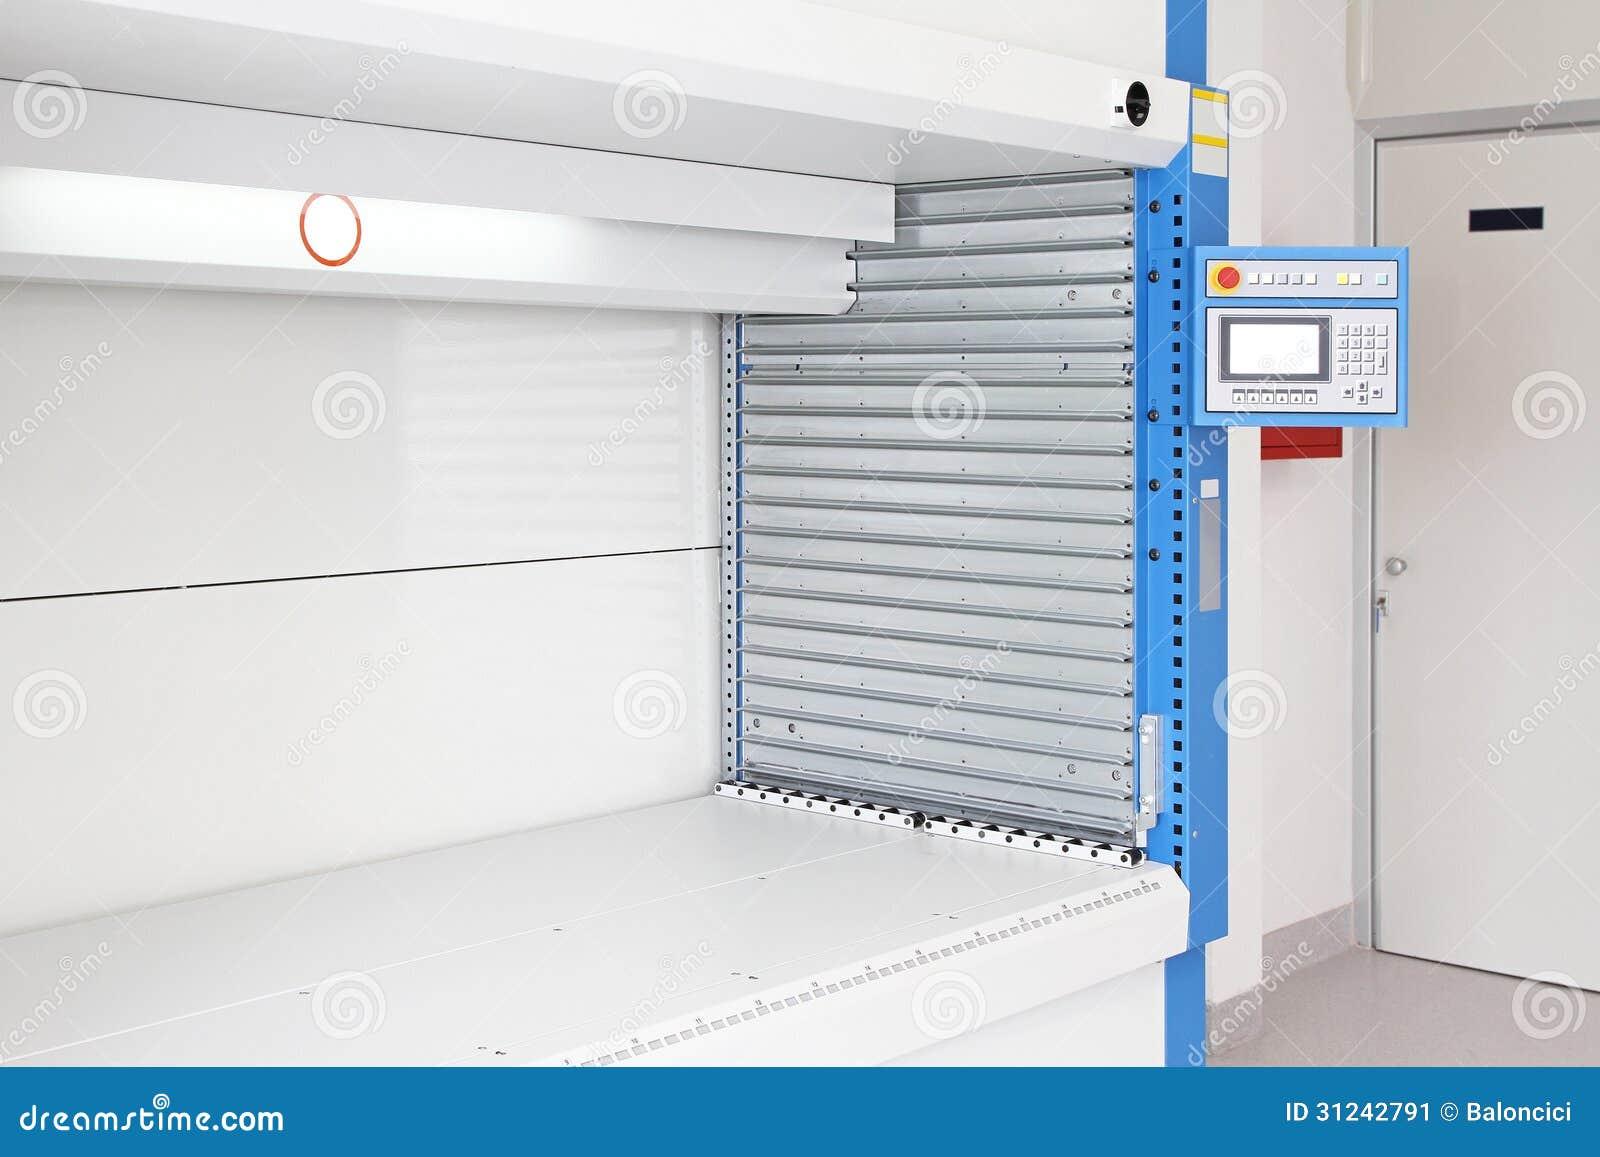 Vertical Carousel Web Design